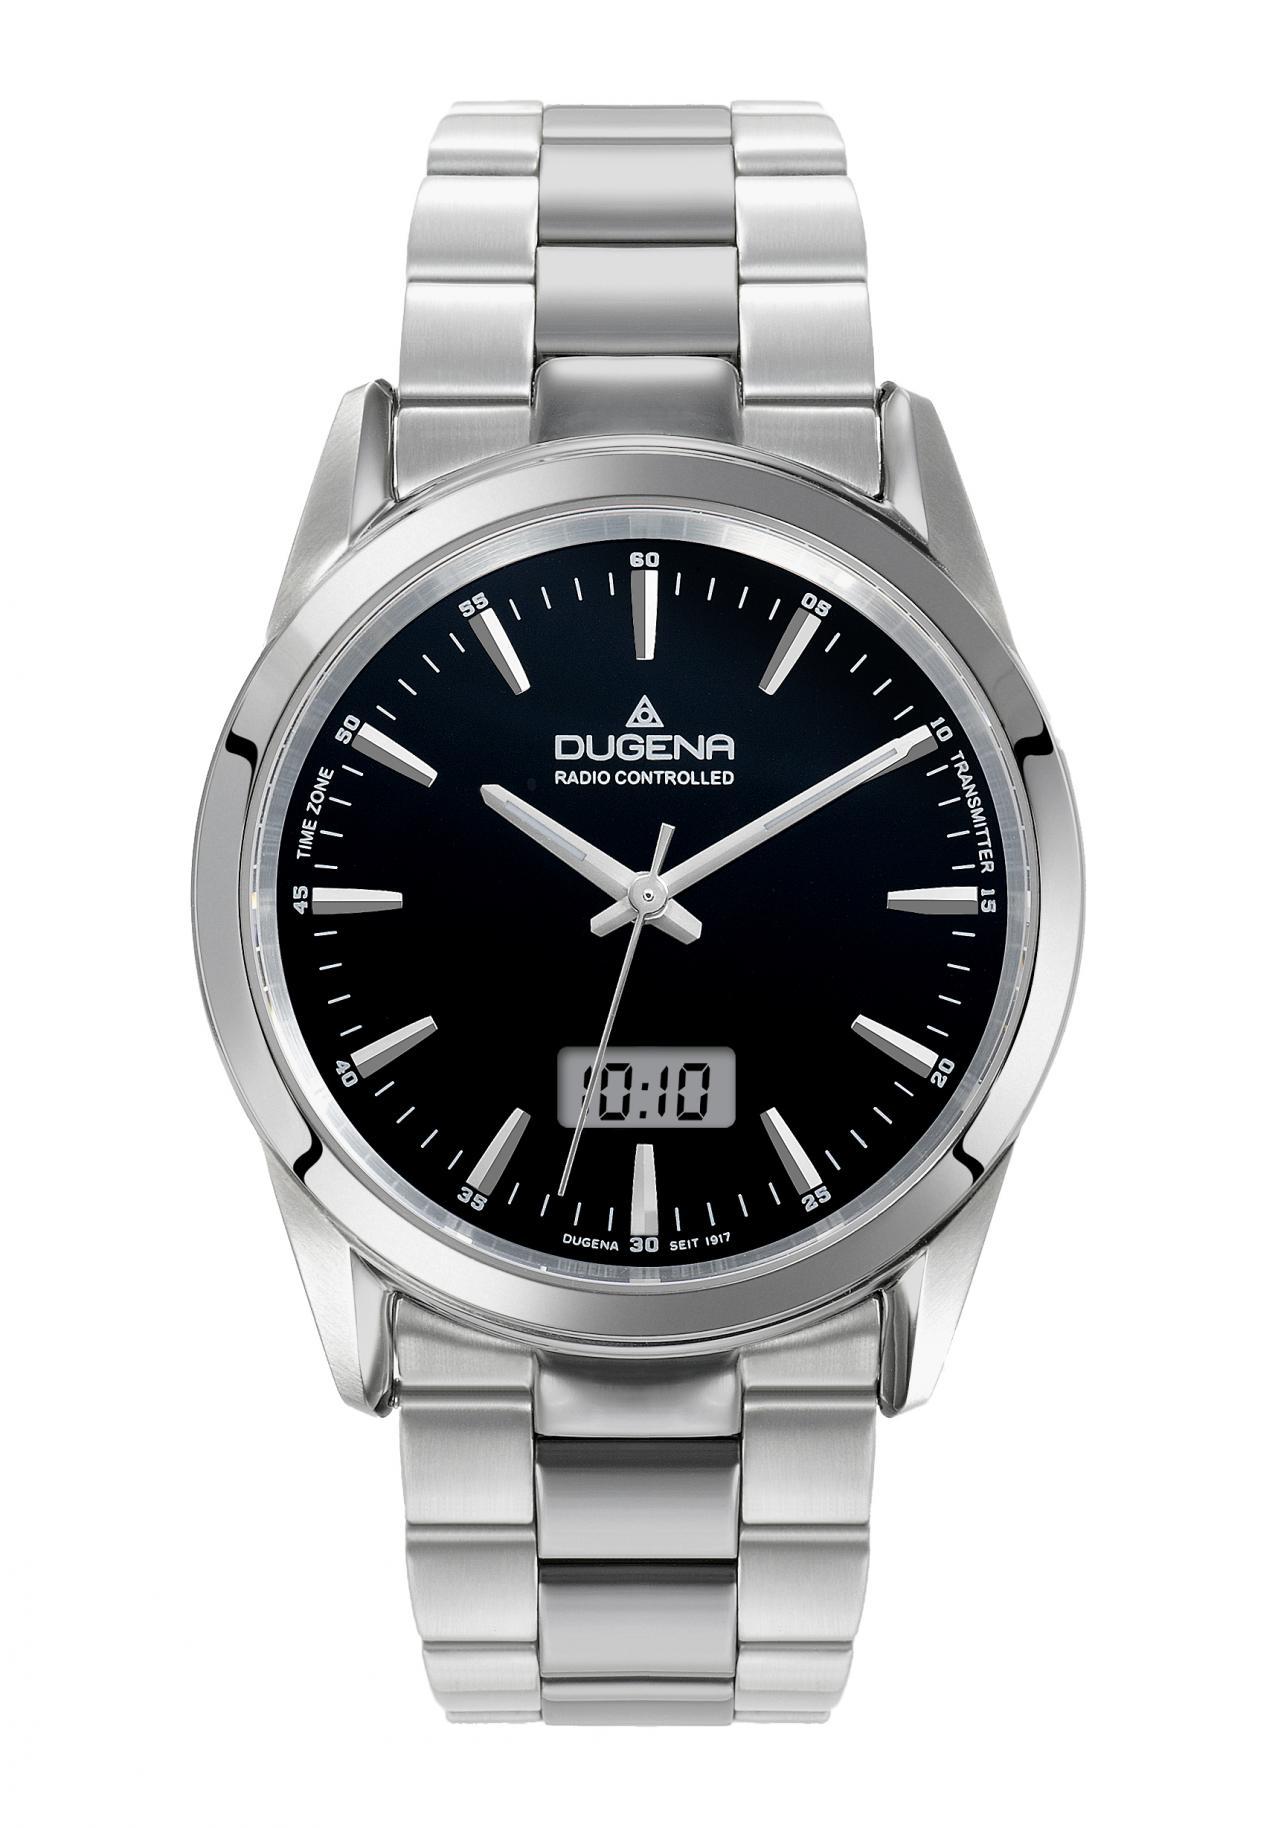 dugena radio watches controlled